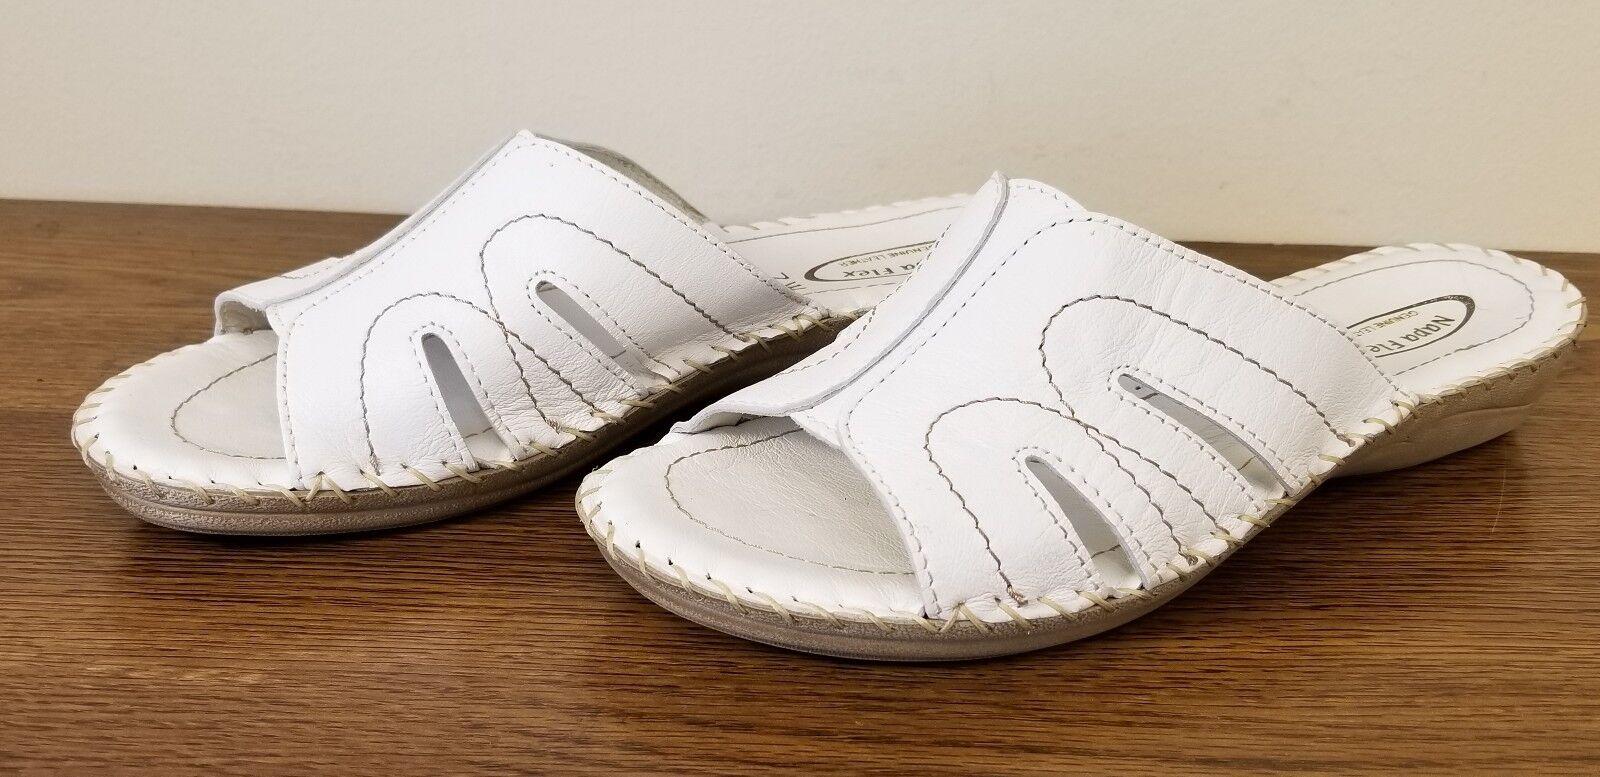 Napa Flex Pronto White Leather Open Size Toe Slide Sandals Women's Size Open /US 7 764b8a